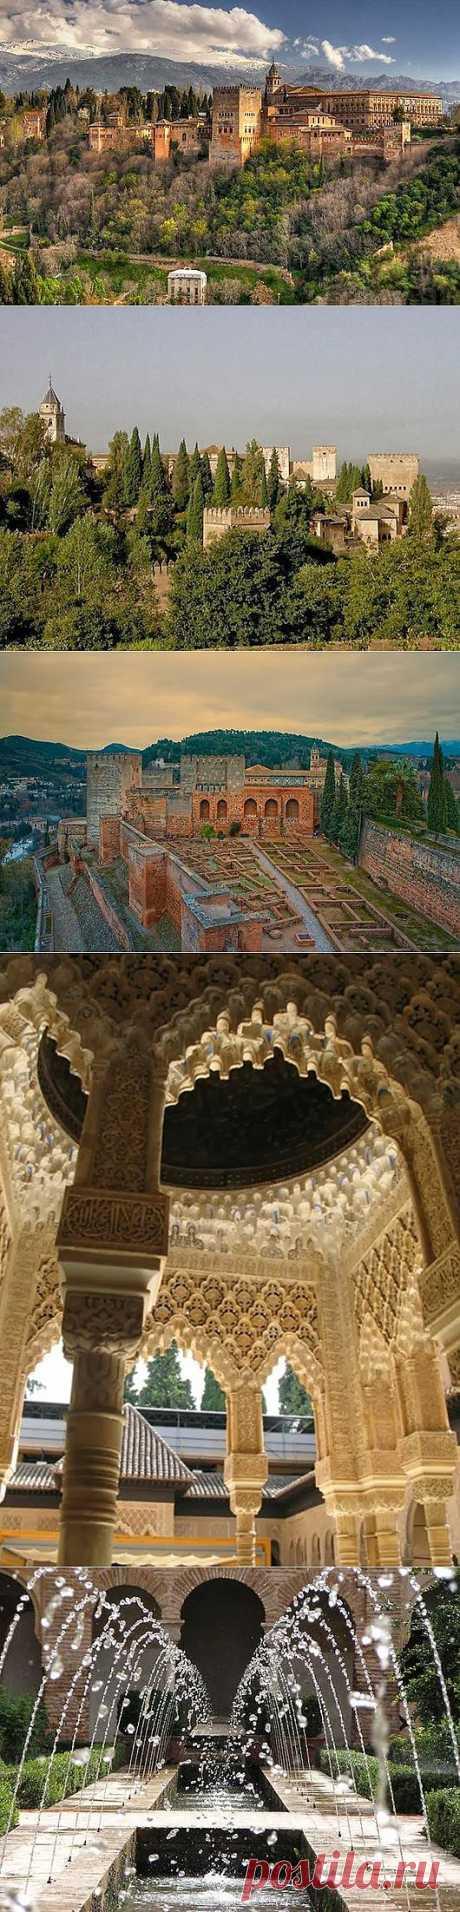 Гранады маленький рай – дворец-крепость Альгамбра | One of Lady - Журнал для женщин